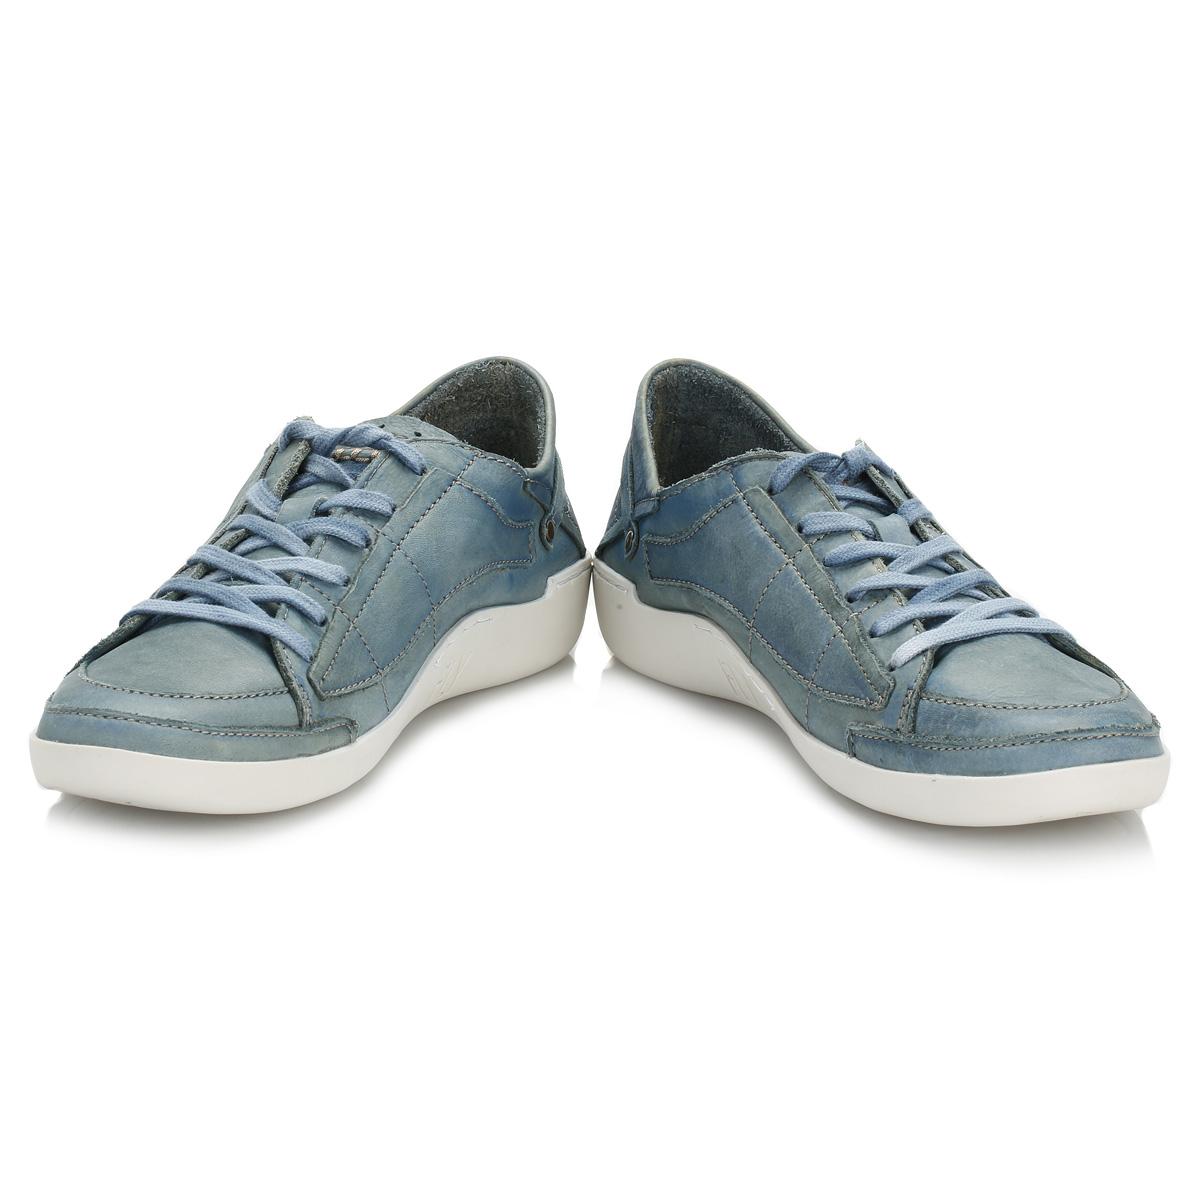 Diesel Shoes Online Australia